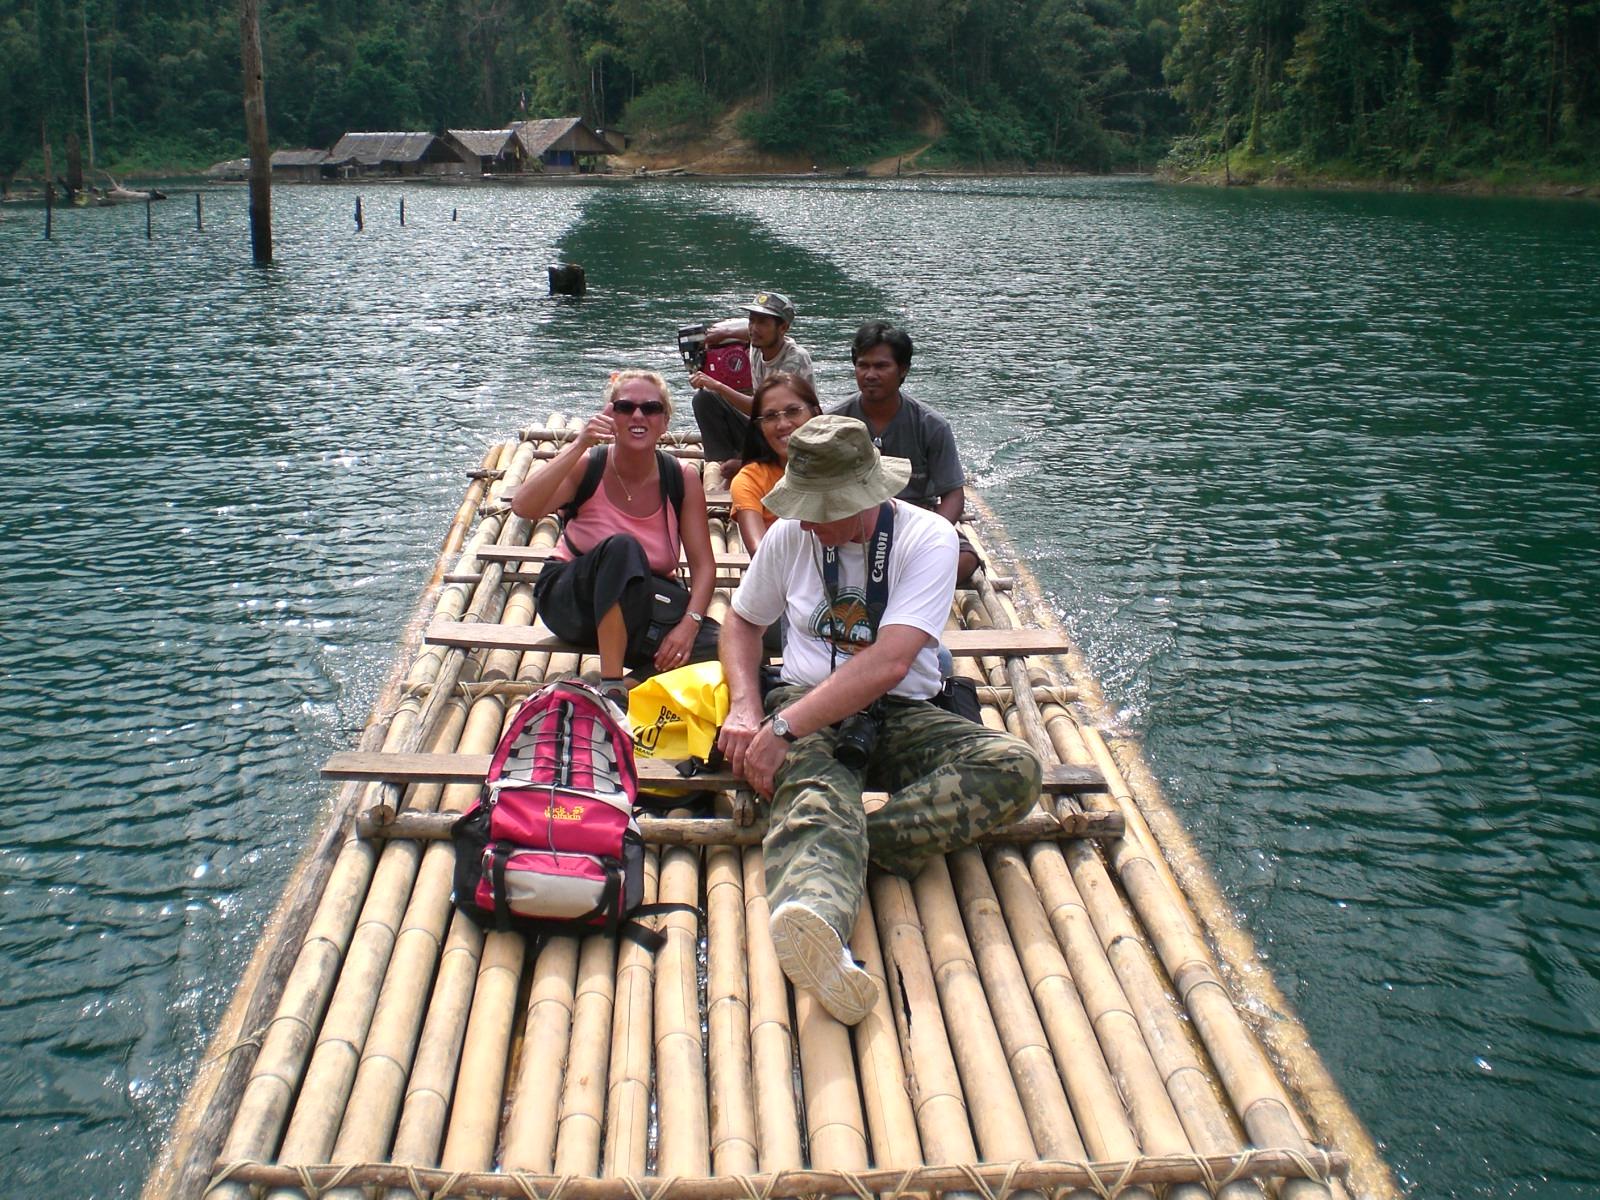 Floßfahrt auf dem Rajjaprabha Stausee